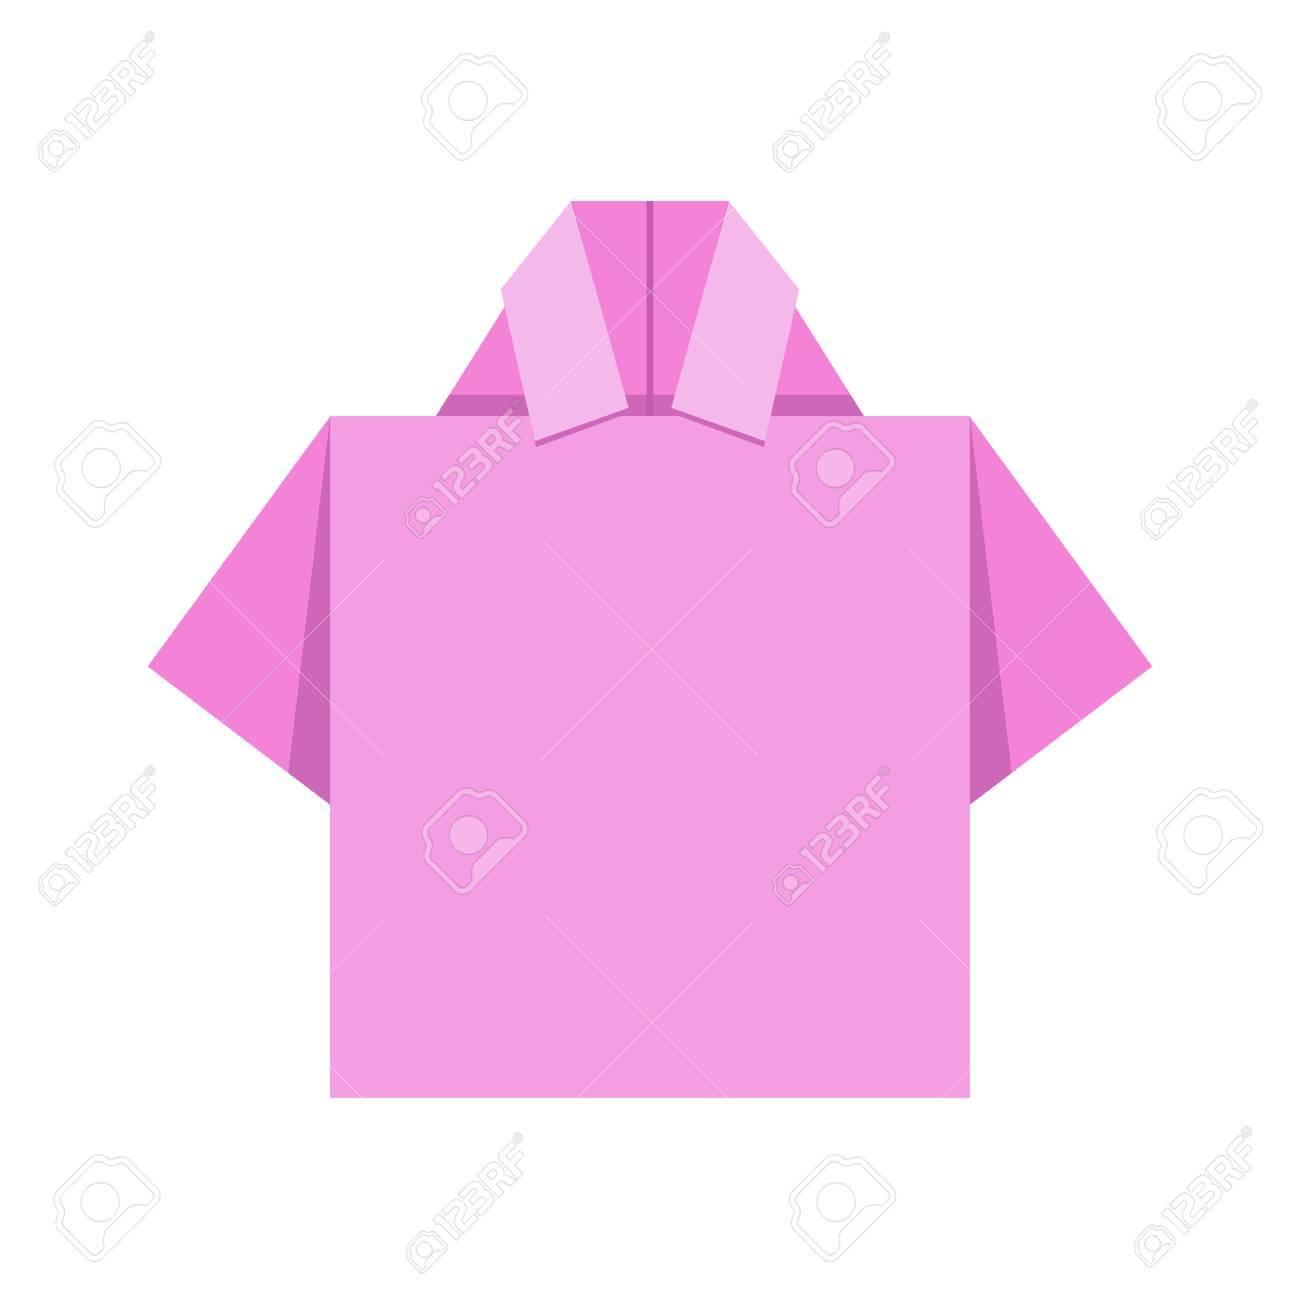 Shirt Origami Vector Design Royalty Free Cliparts Vectors And